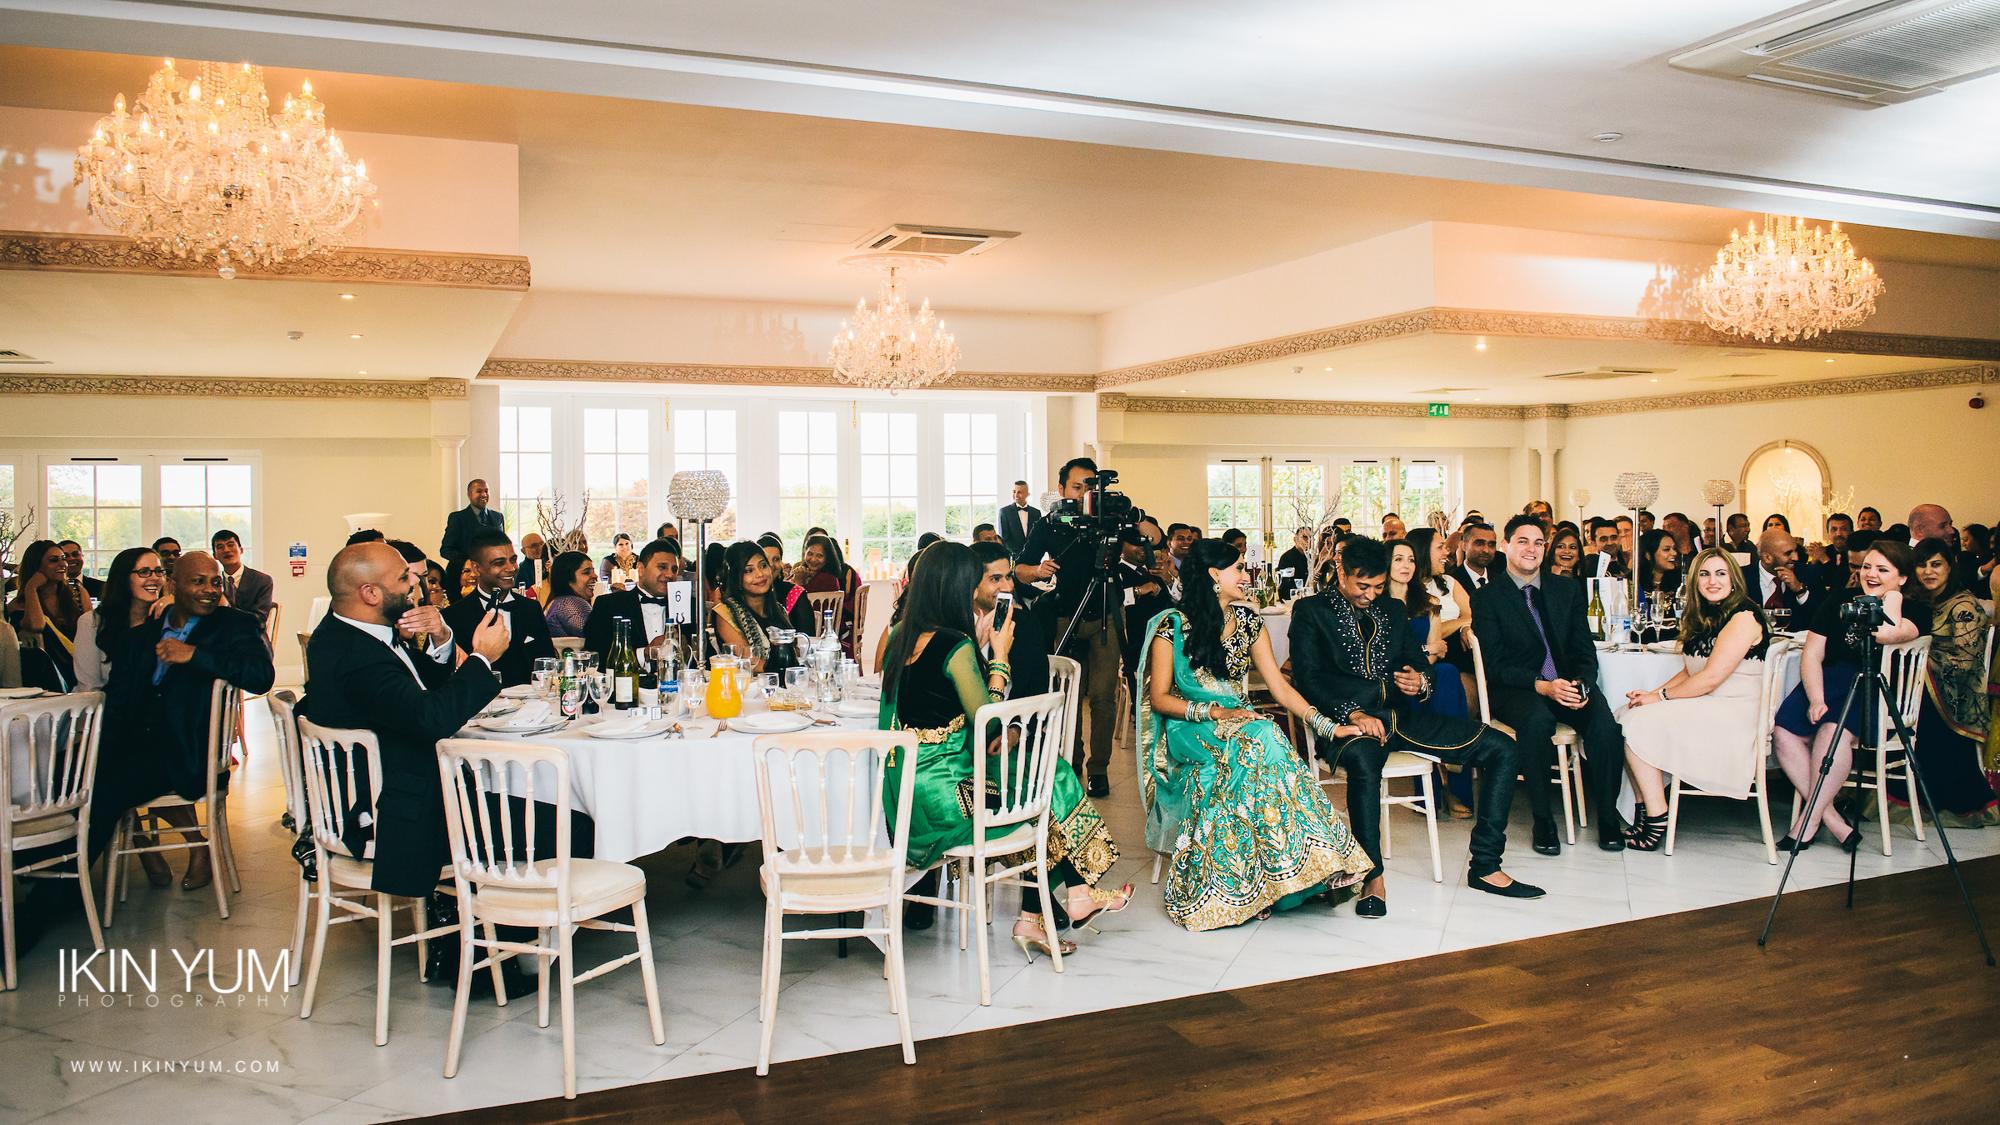 Froyle Park Indian Wedding - Ikin Yum Photography-138.jpg